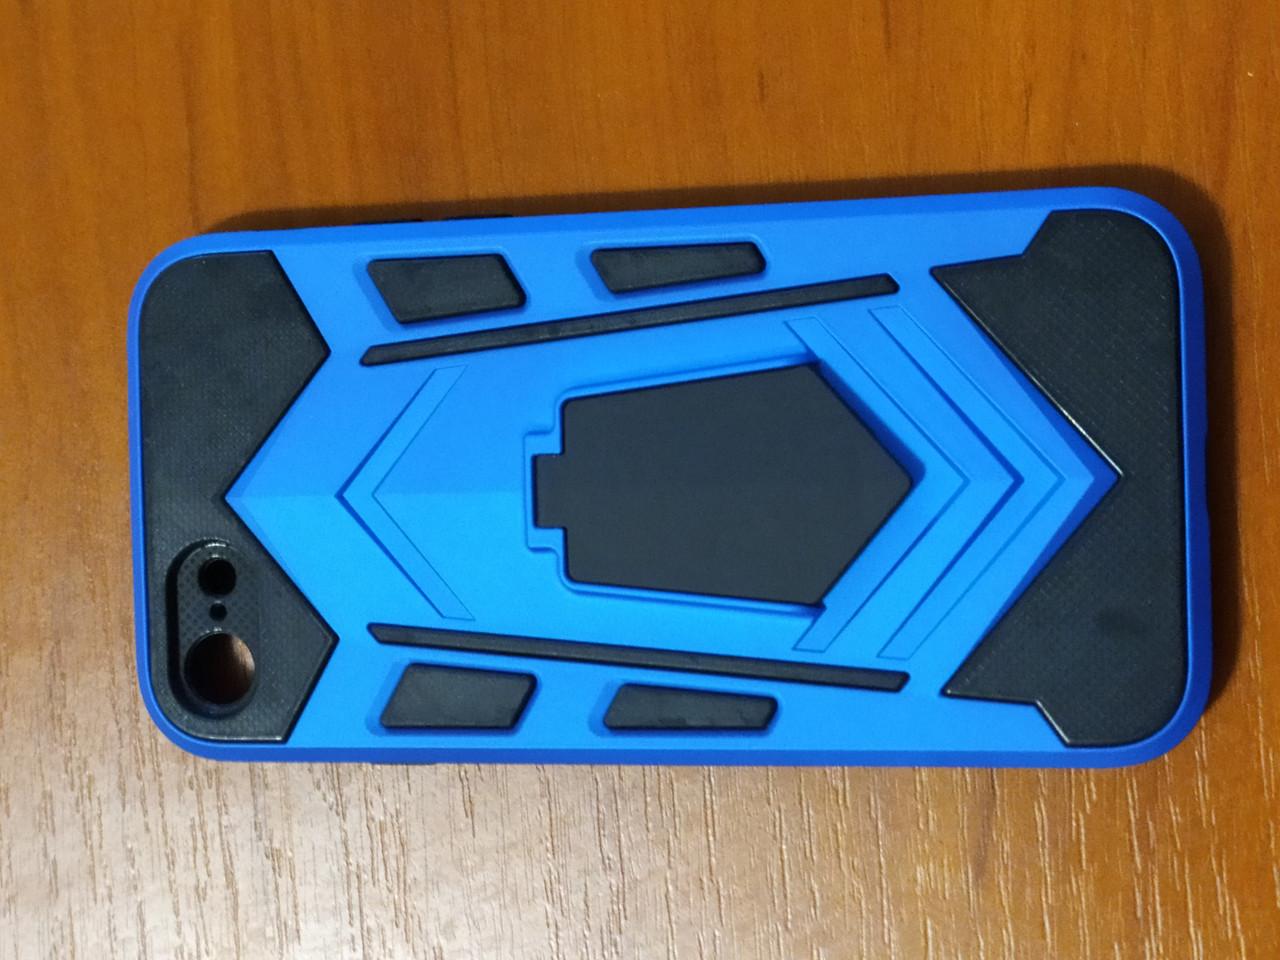 Накладка  Armor Case  iPhone 7 / 8 / SE 2020  с подставкой  (синий)